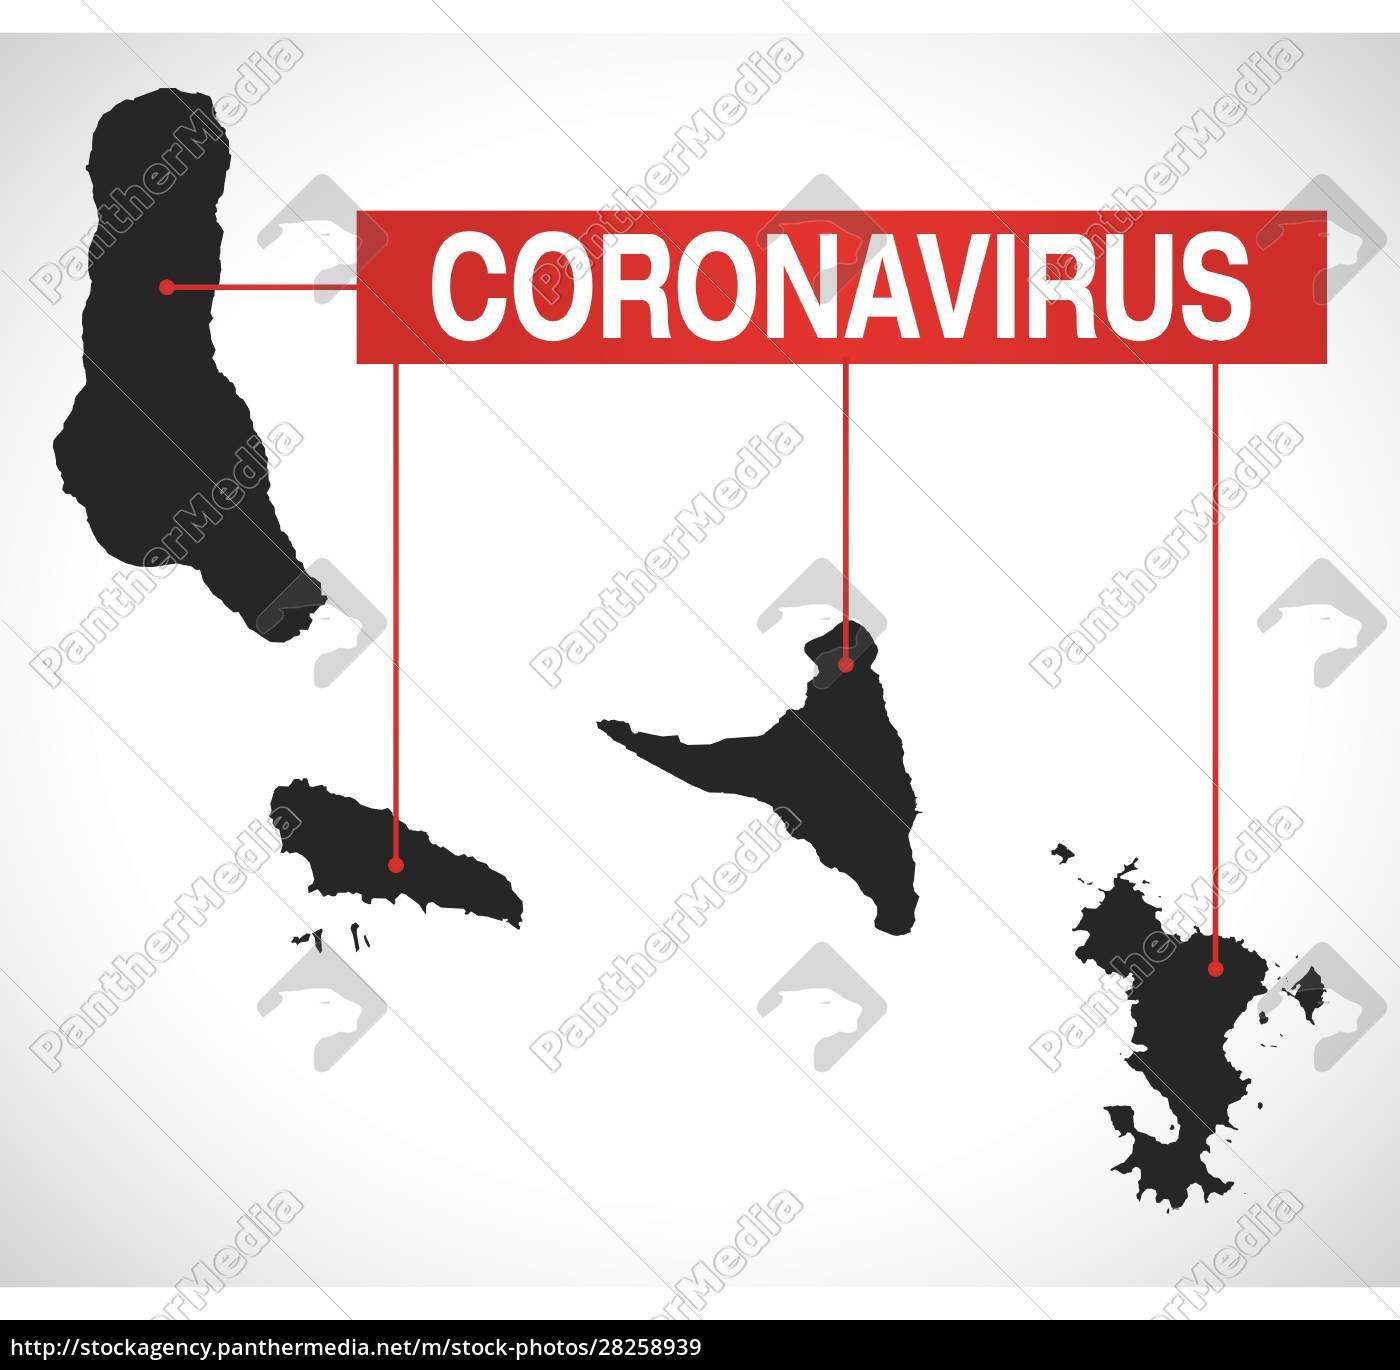 comoros, map, with, coronavirus, warning, illustration - 28258939